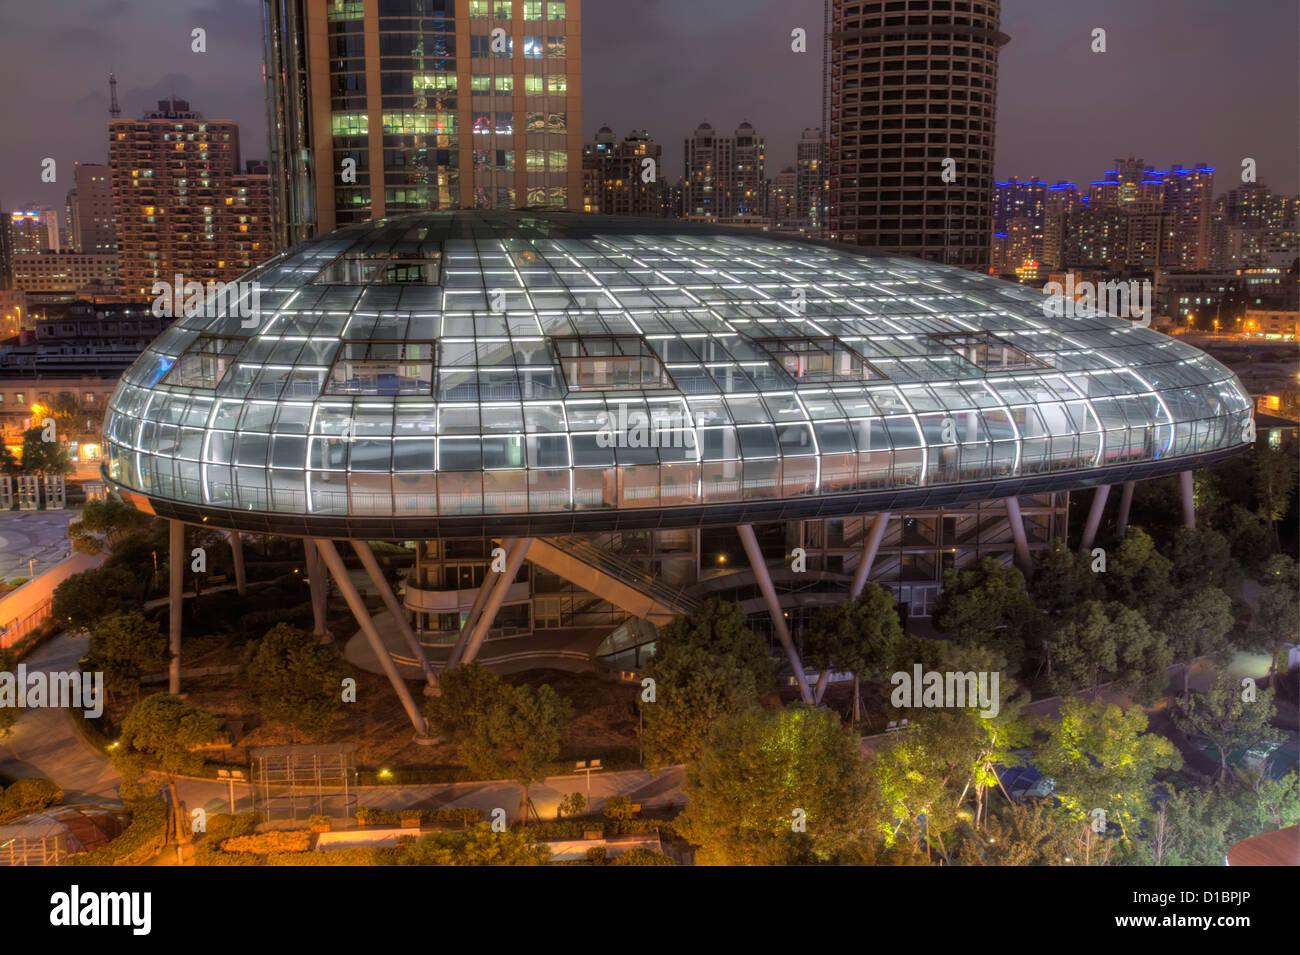 The International Cruise Terminal, Shanghai, China. - Stock Image